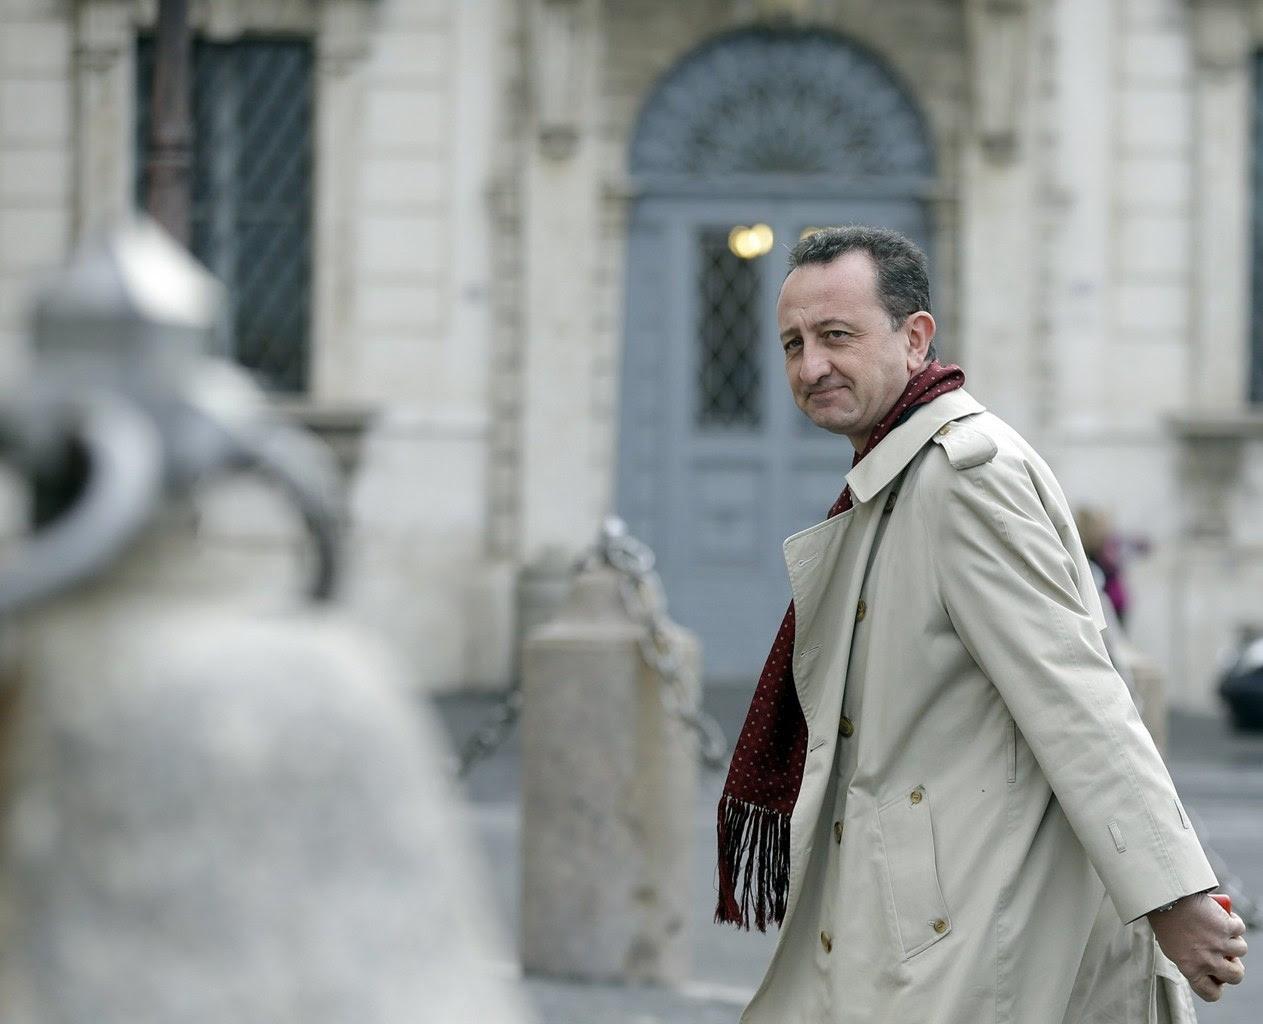 O δικηγόρος του αρχινονού Λούκα Τσιανφερόνι